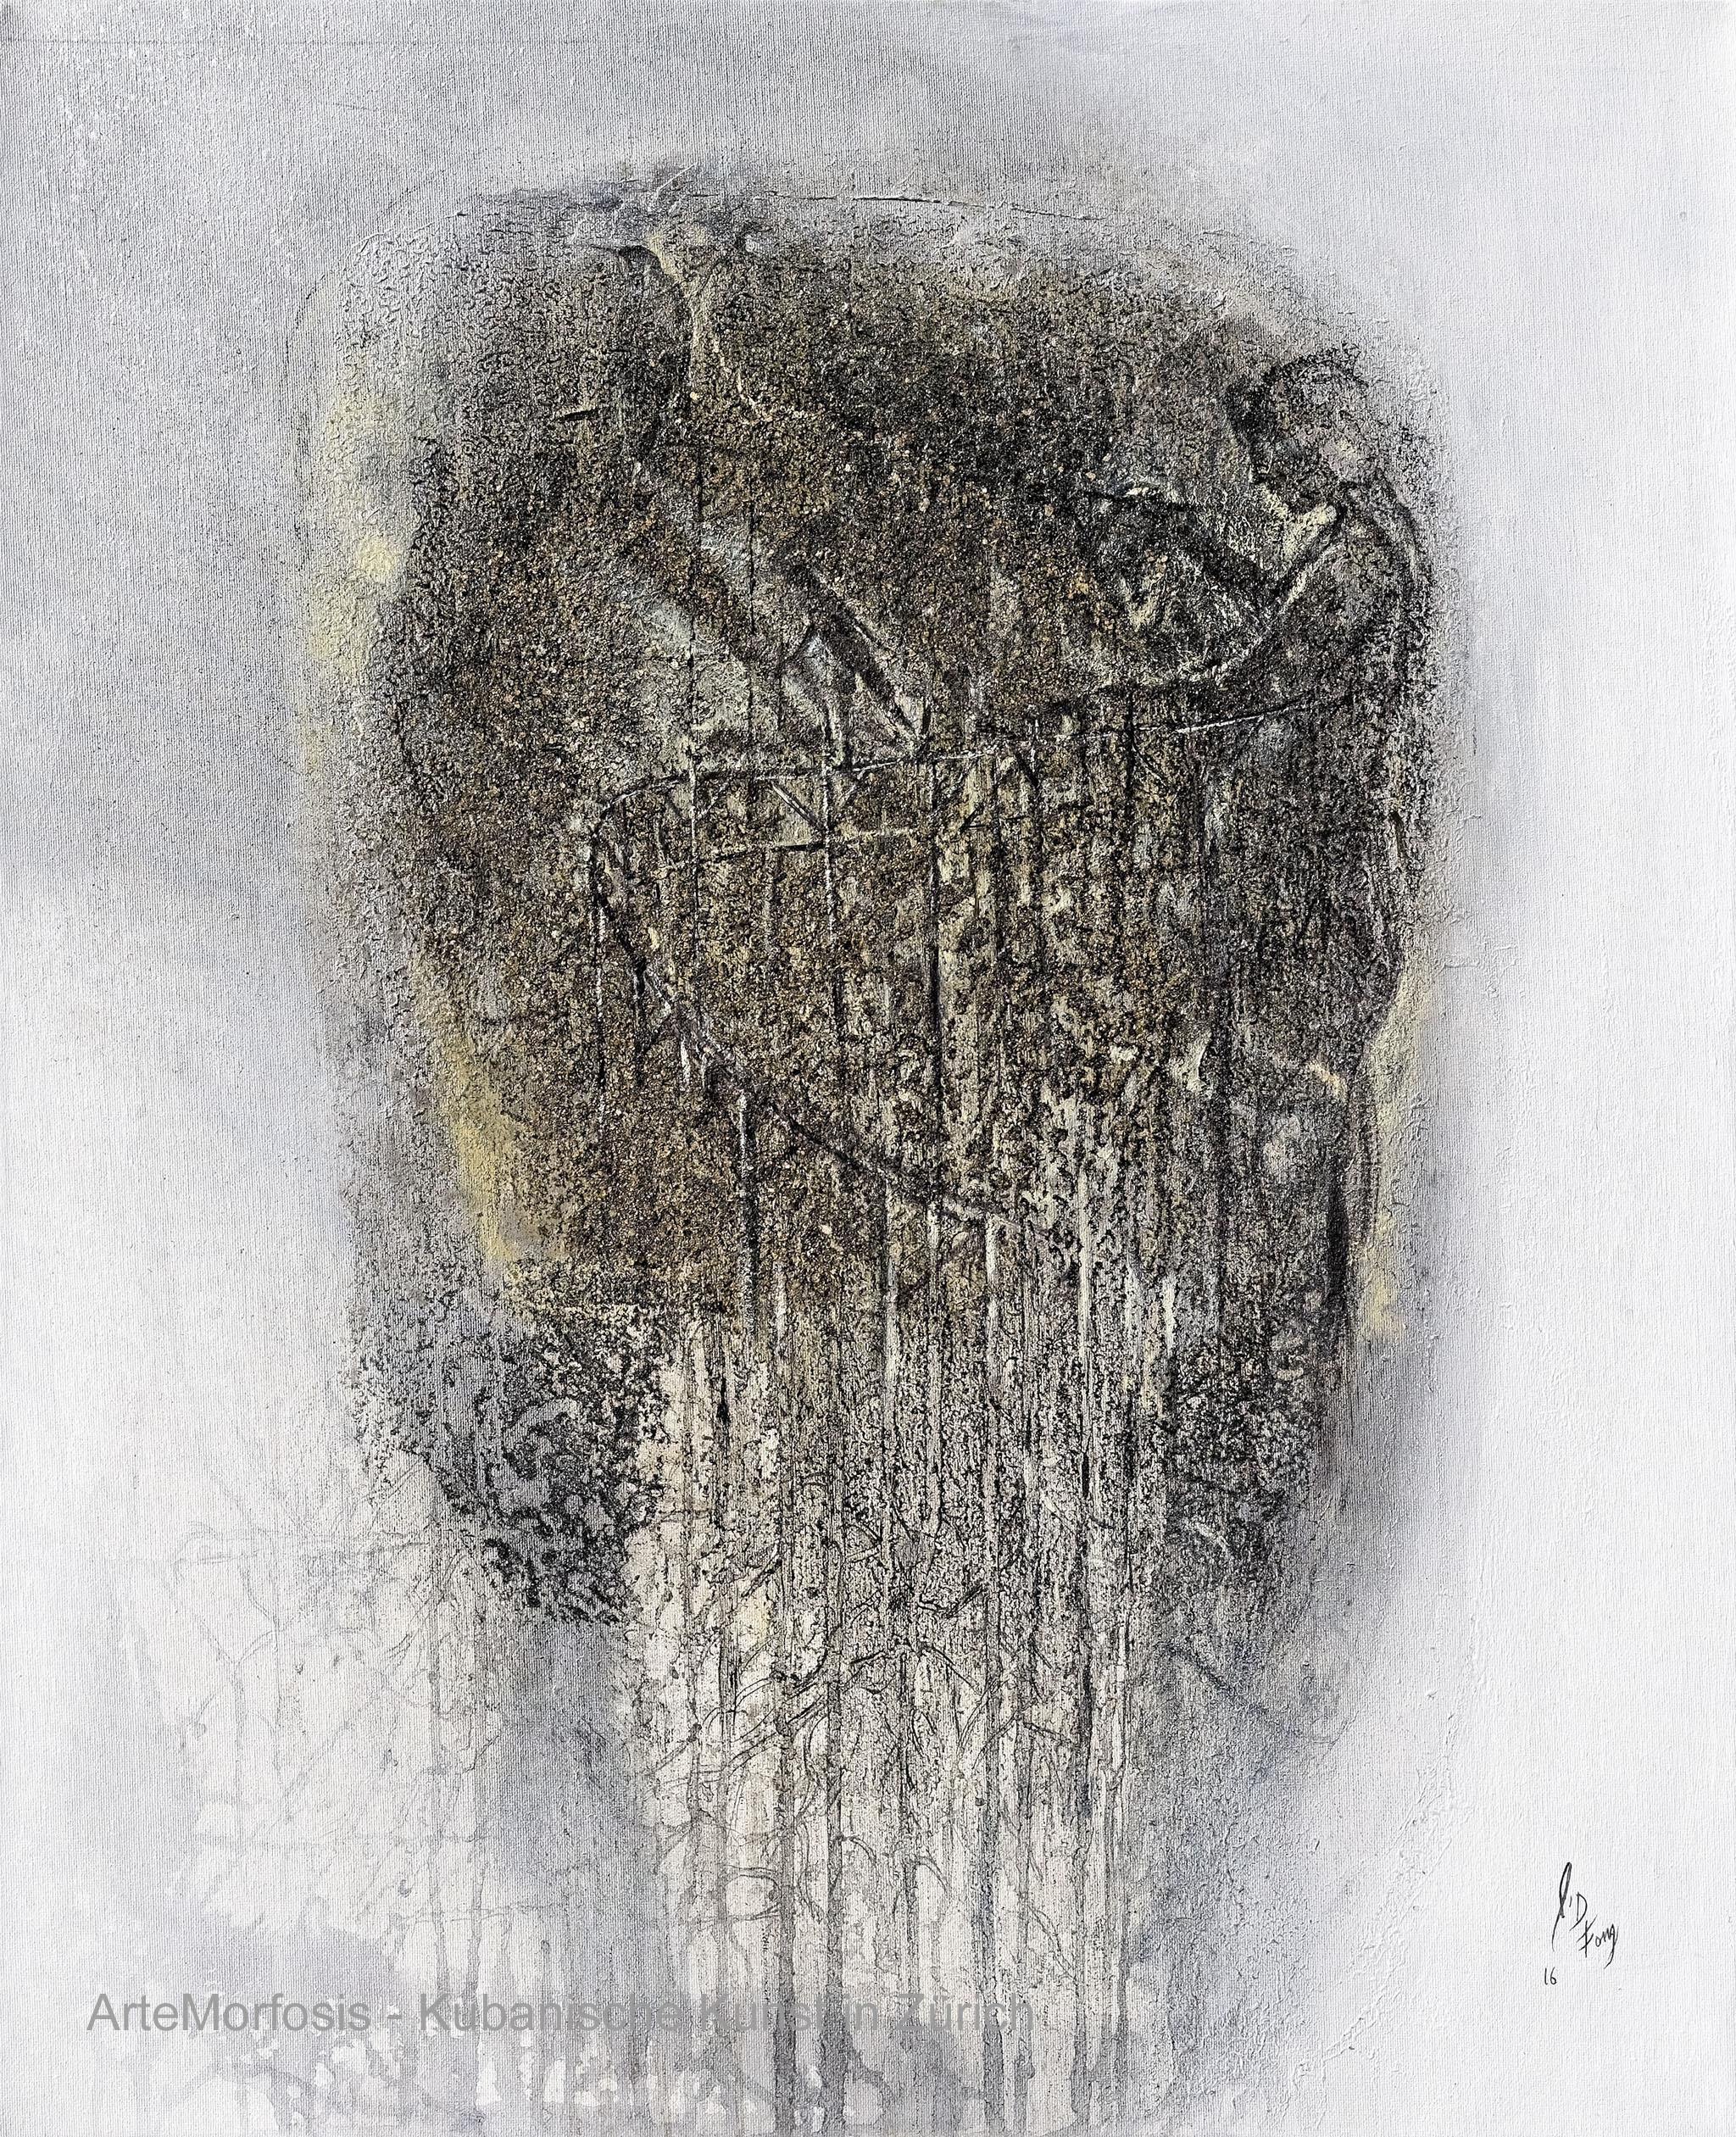 Li D Fong: Escenario I / Scenario 1 - Mixed on Canvas - 2016 - 80 x 65 cm